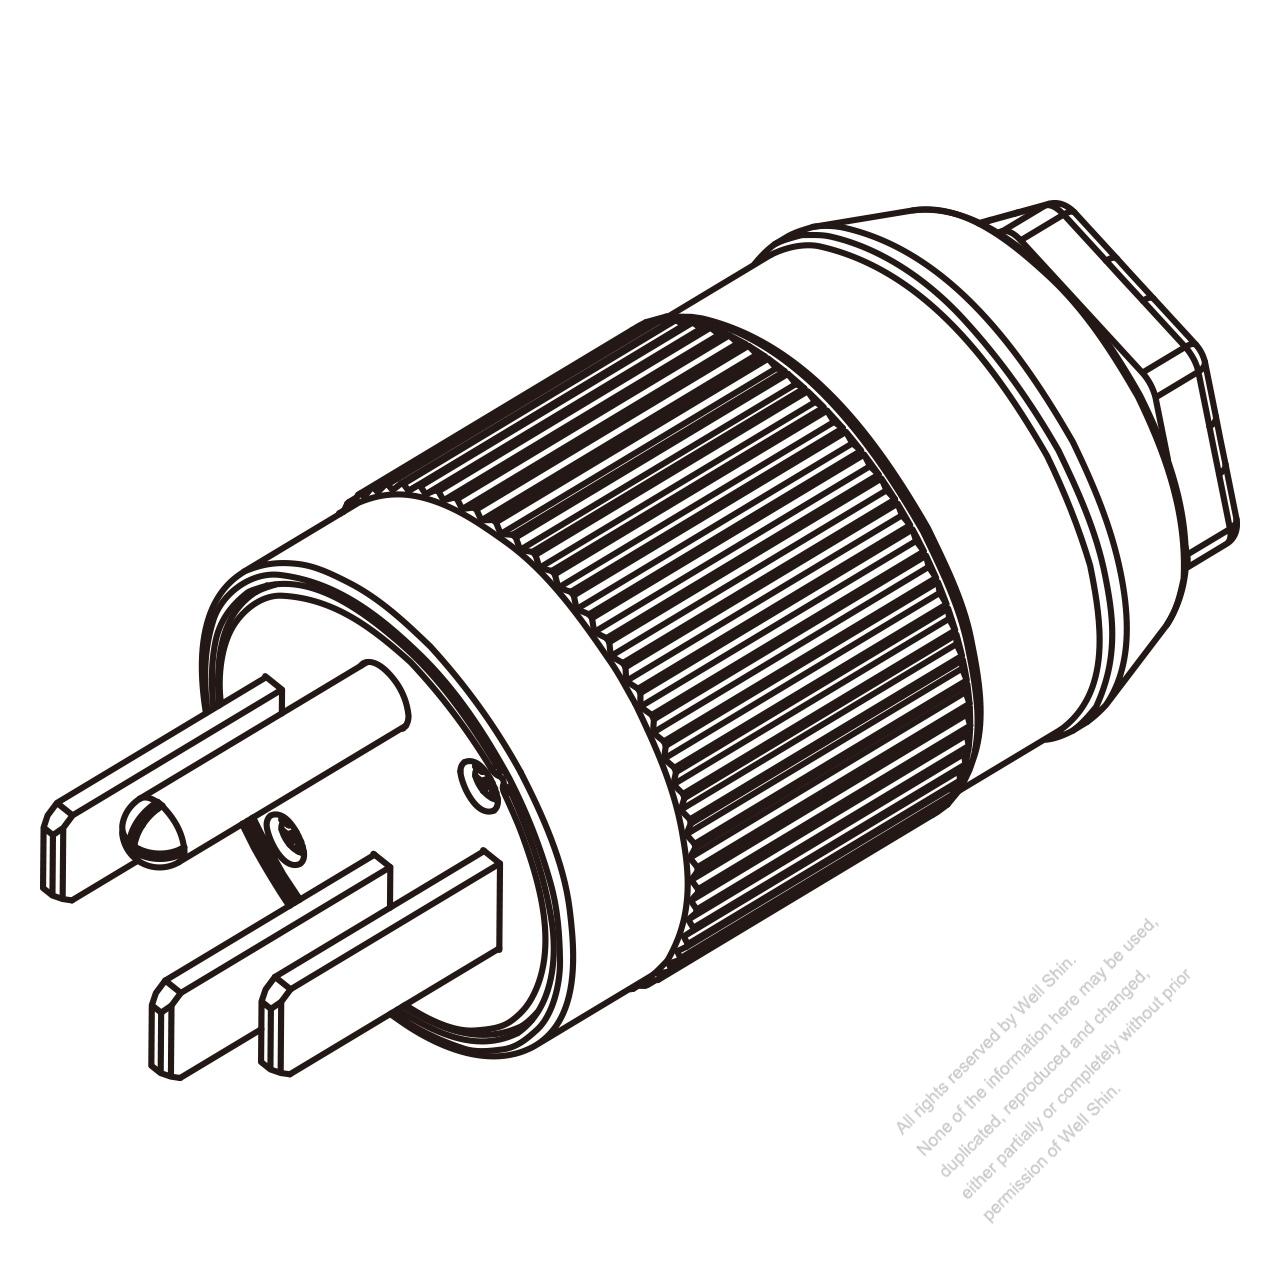 hight resolution of usa canada plug nema 14 50p 4 pin 3 p